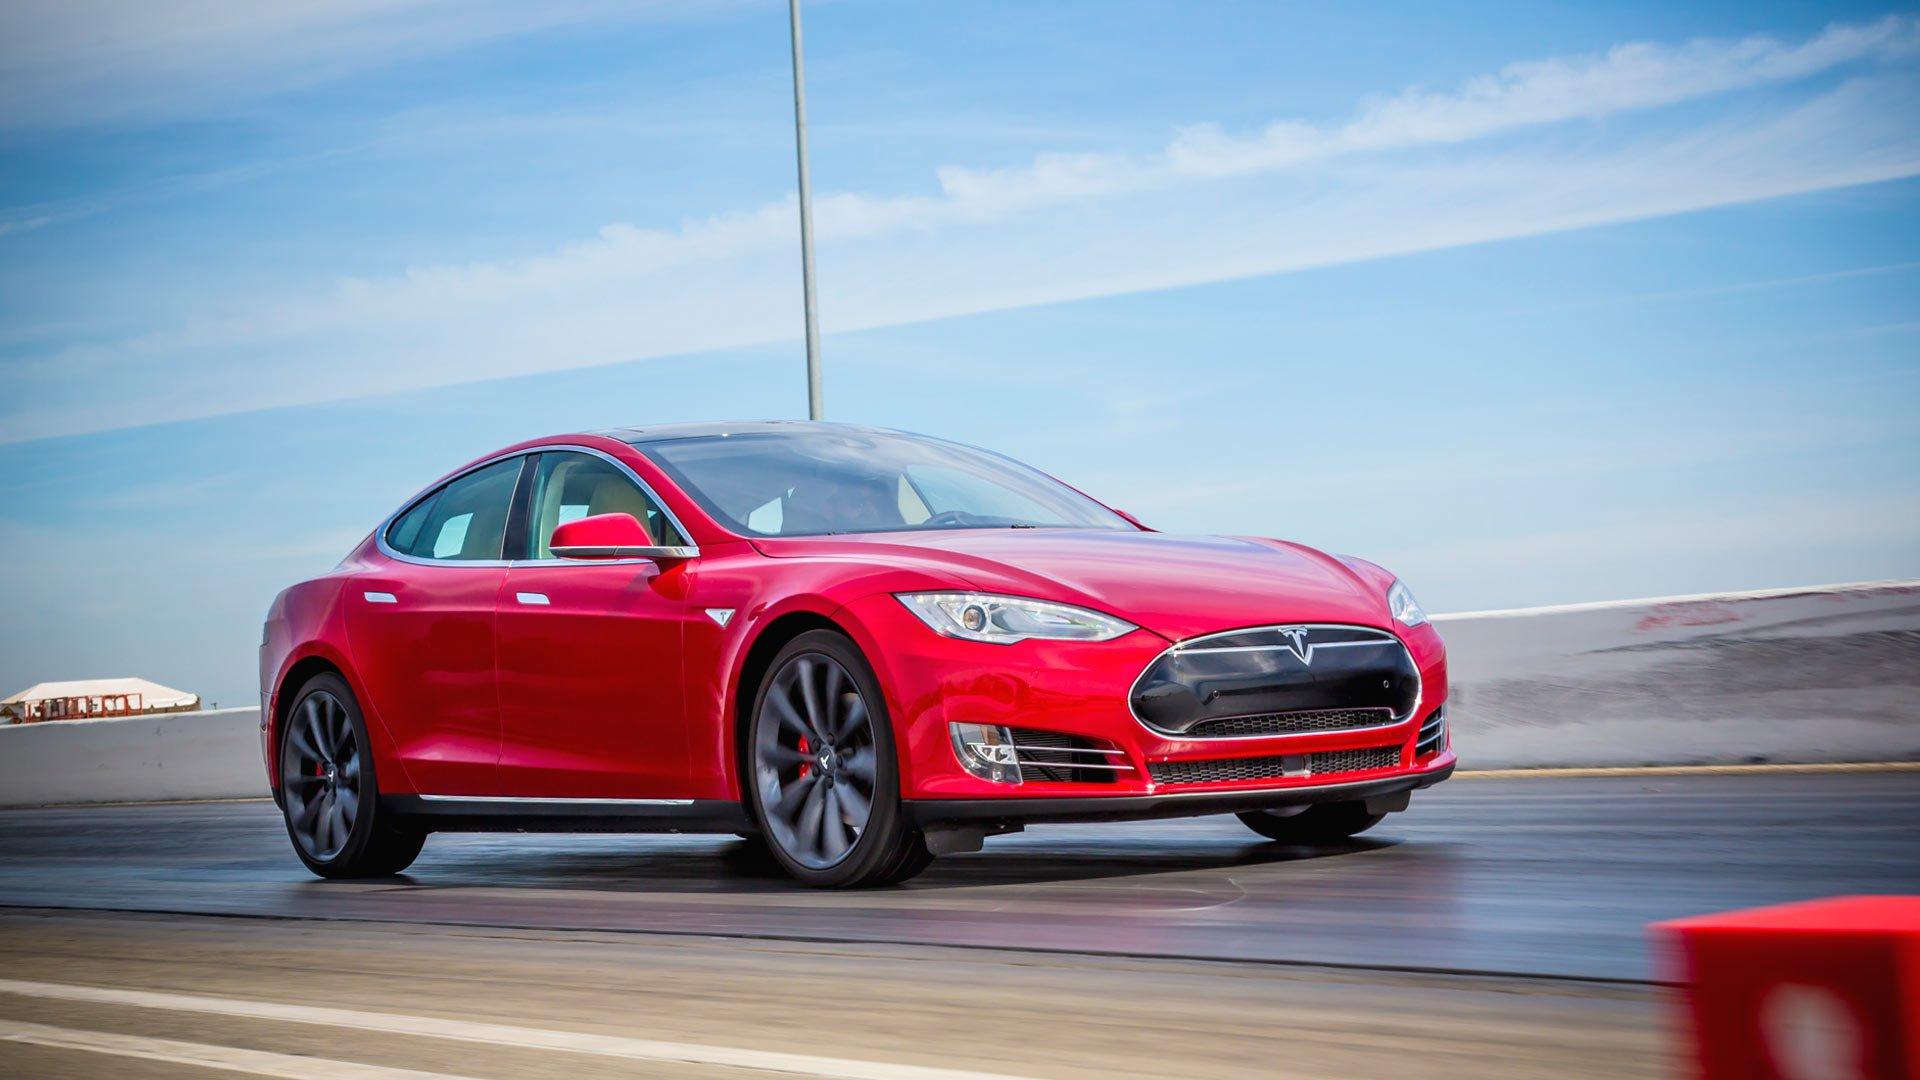 Tesla full hd 1080p wallpaper